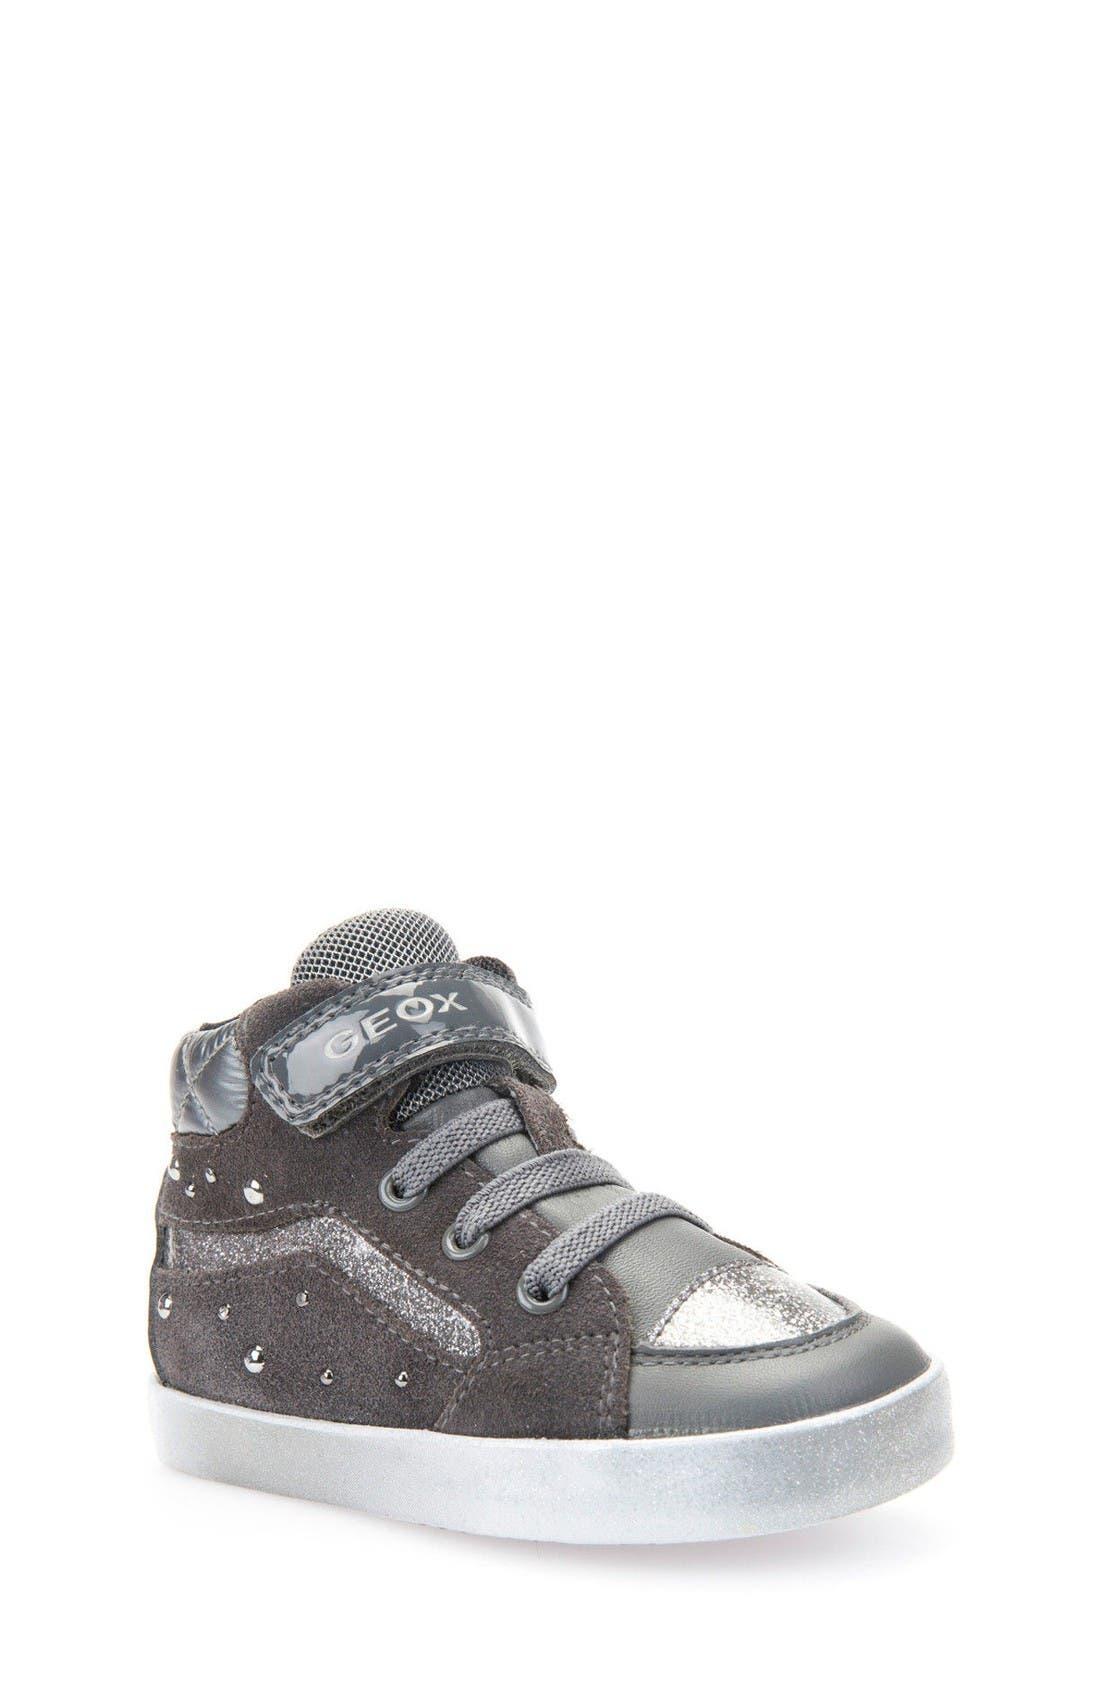 Kiwi Studded High Top Sneaker,                             Main thumbnail 1, color,                             Dark Grey